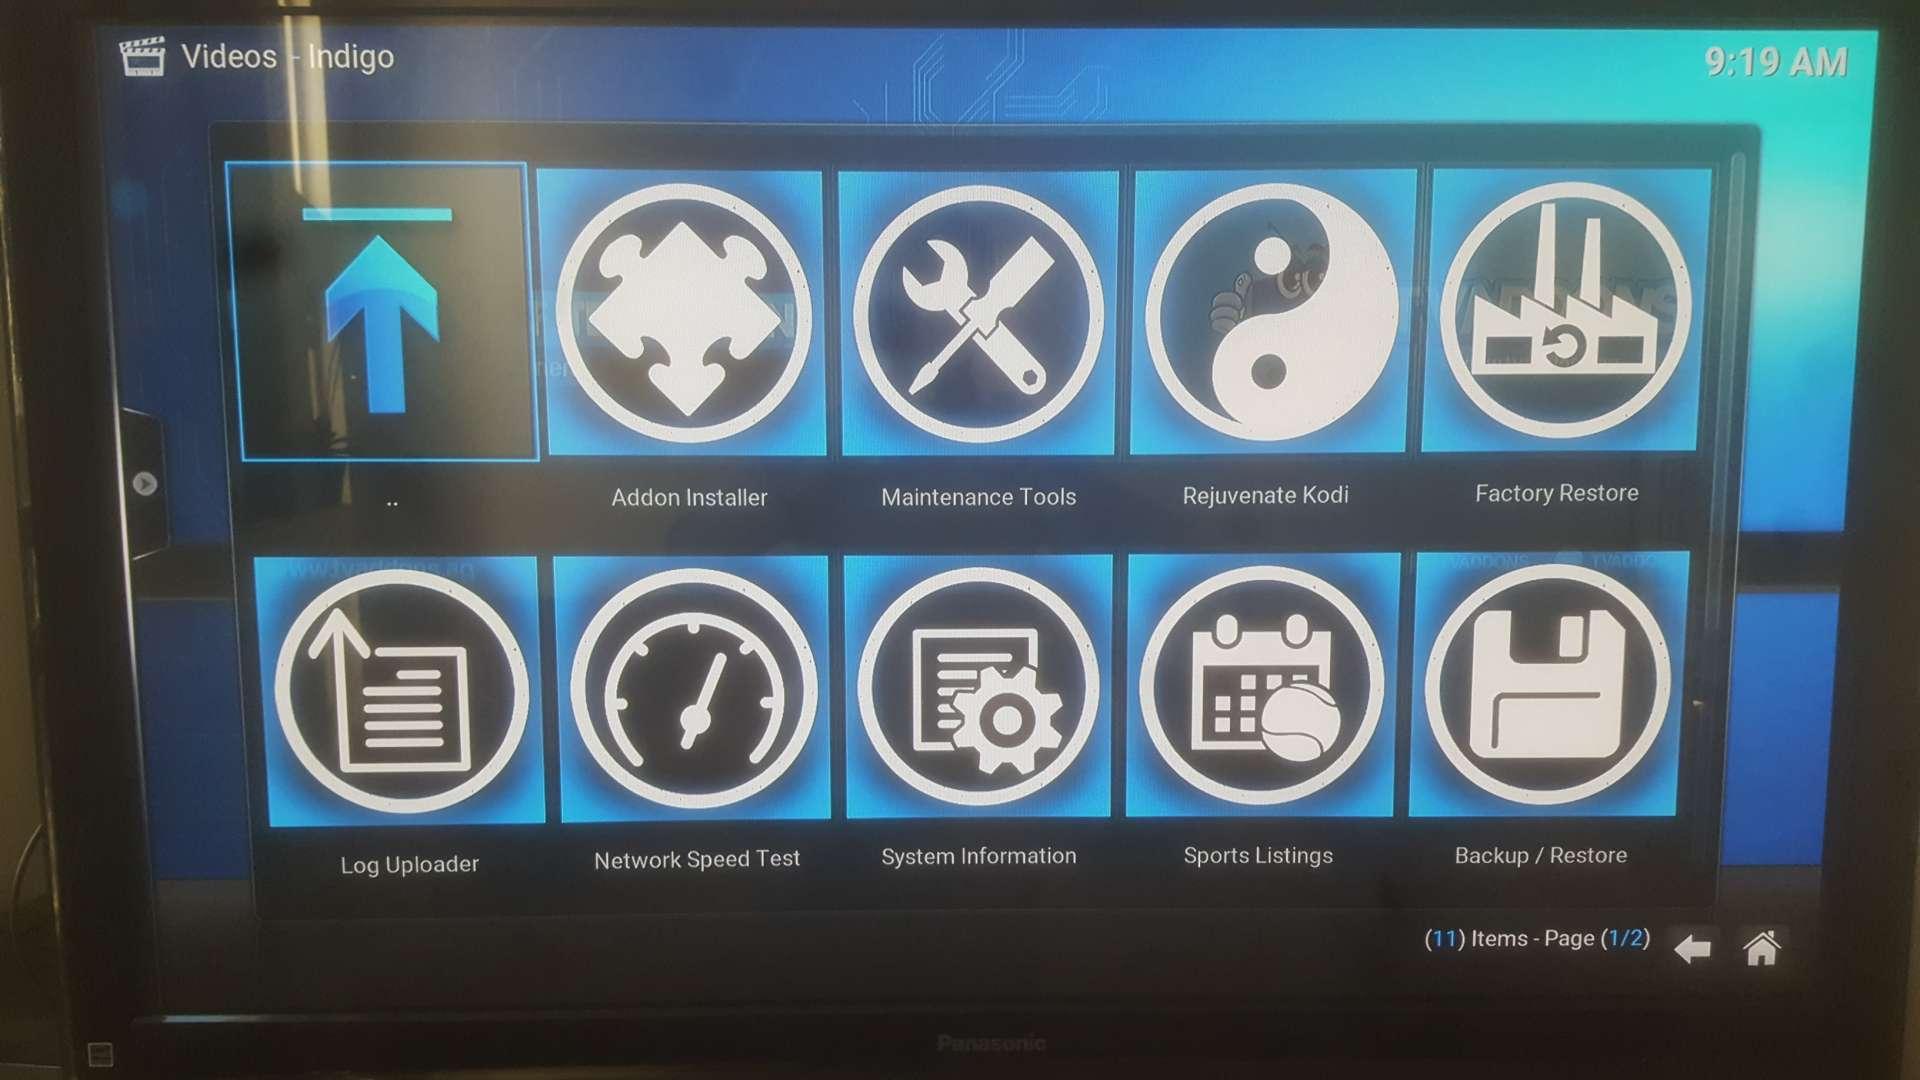 Kodi Indigo Install: How to Install TV Addons + Config Wizard with Indigo Wizard